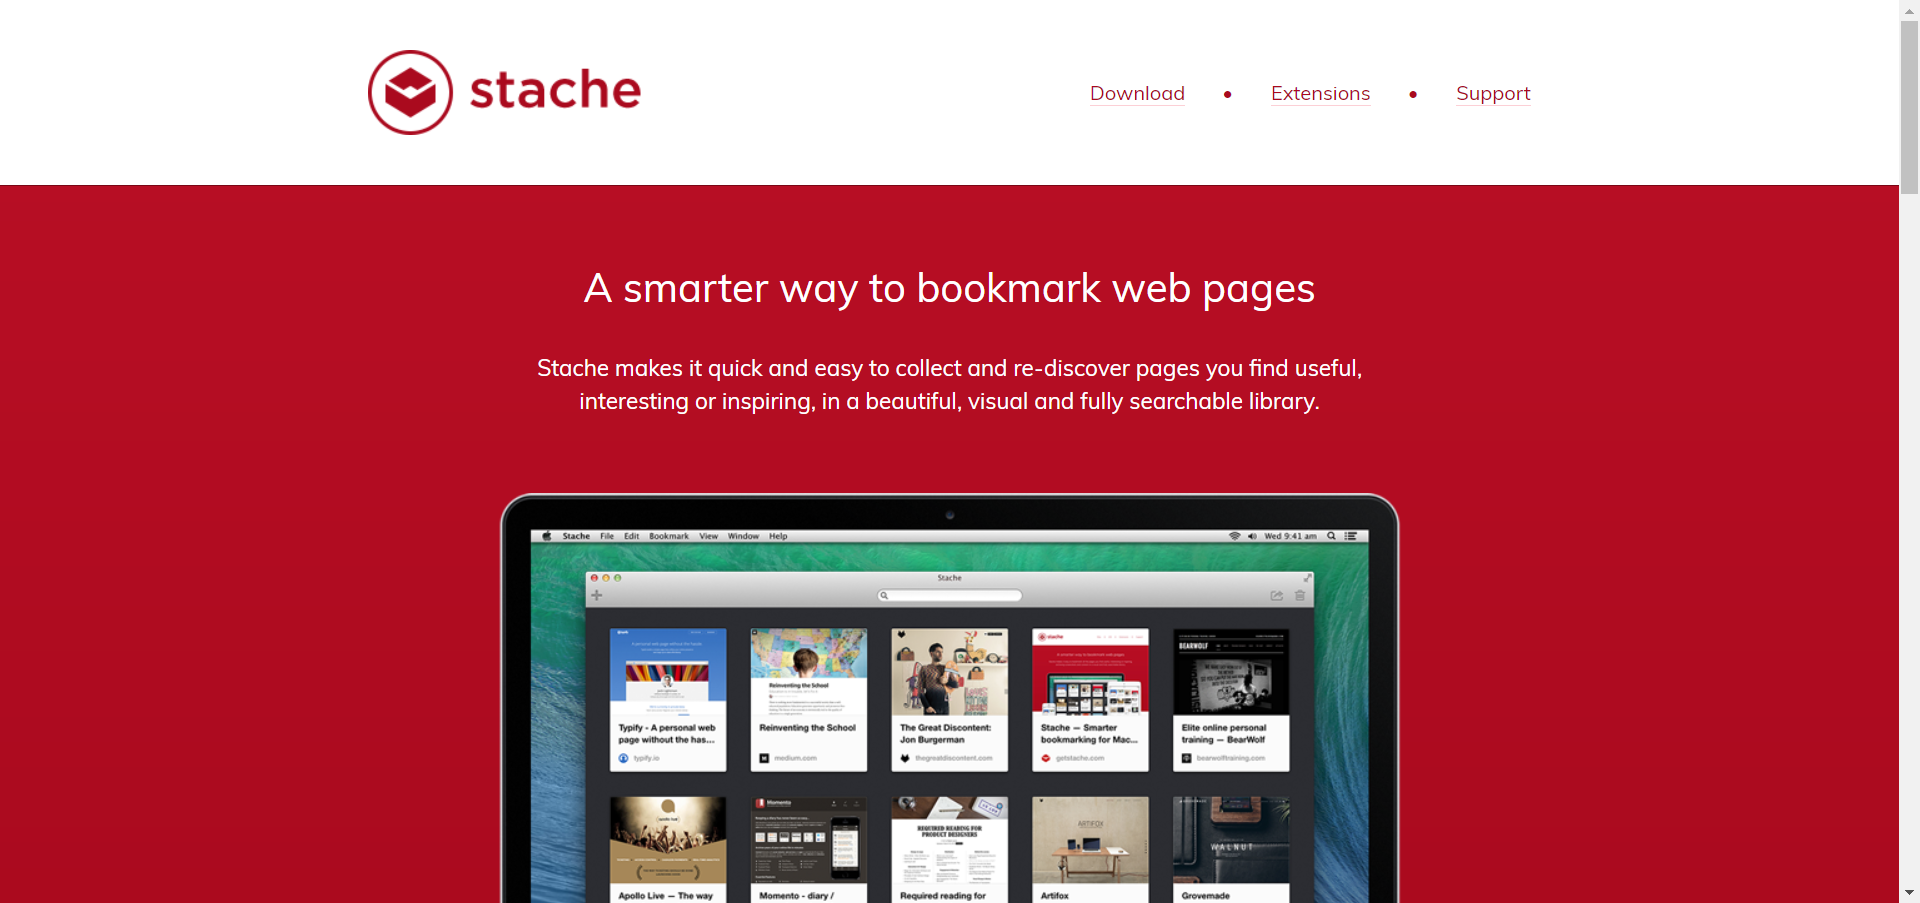 Stache website image